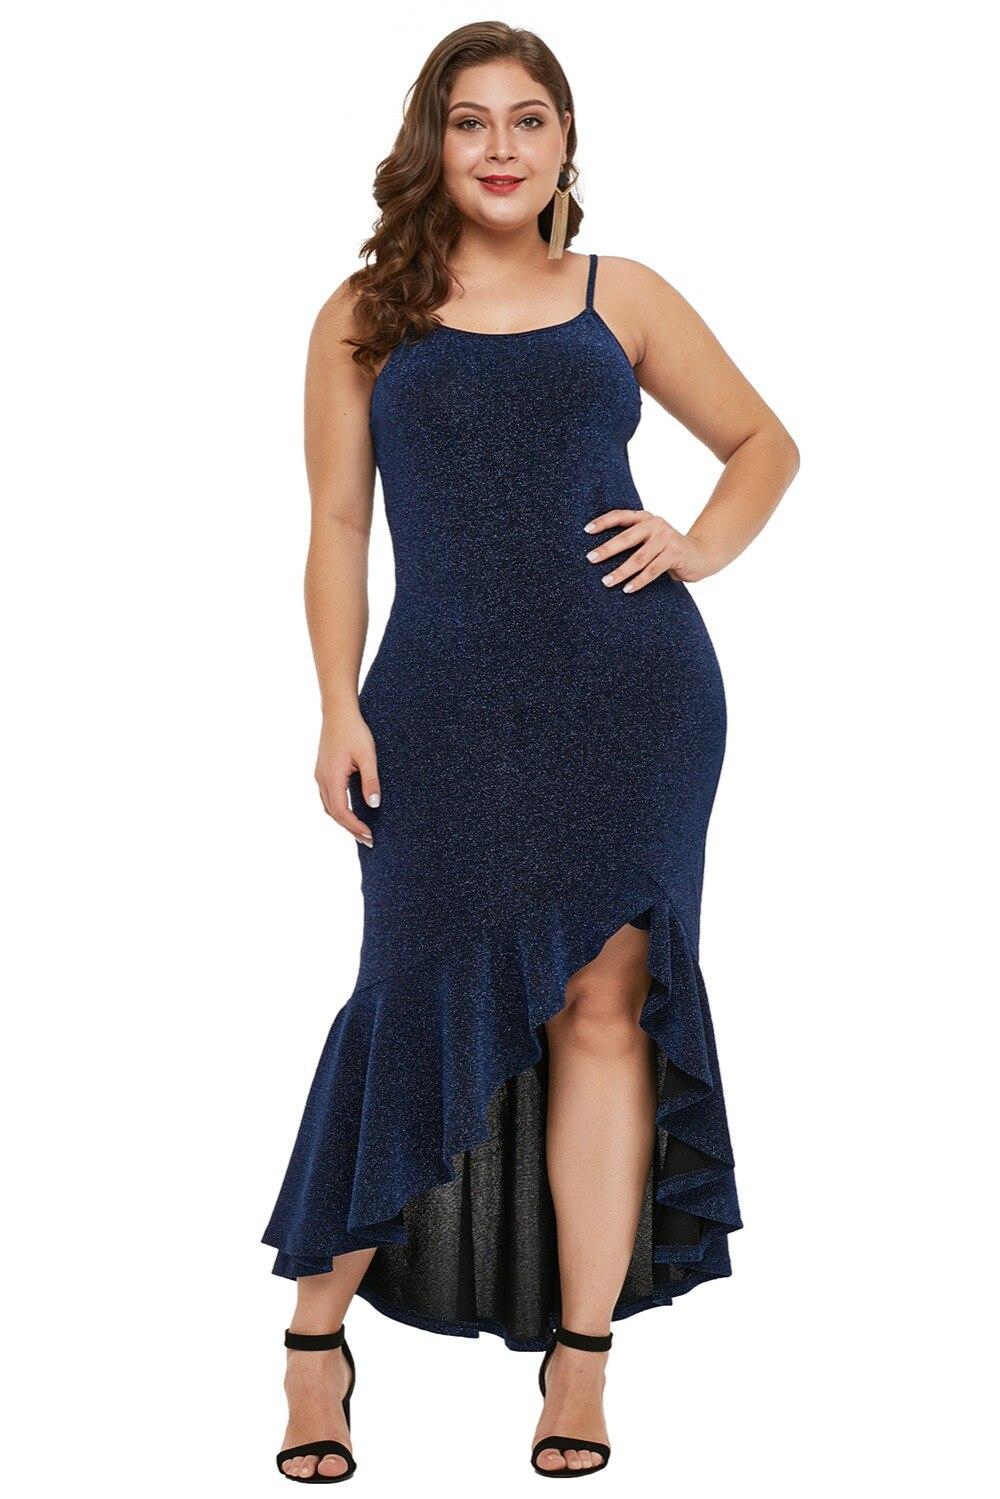 Navy-Blue-True-Shine-Plus-Size-High-low-Dress-LC610939-5-1